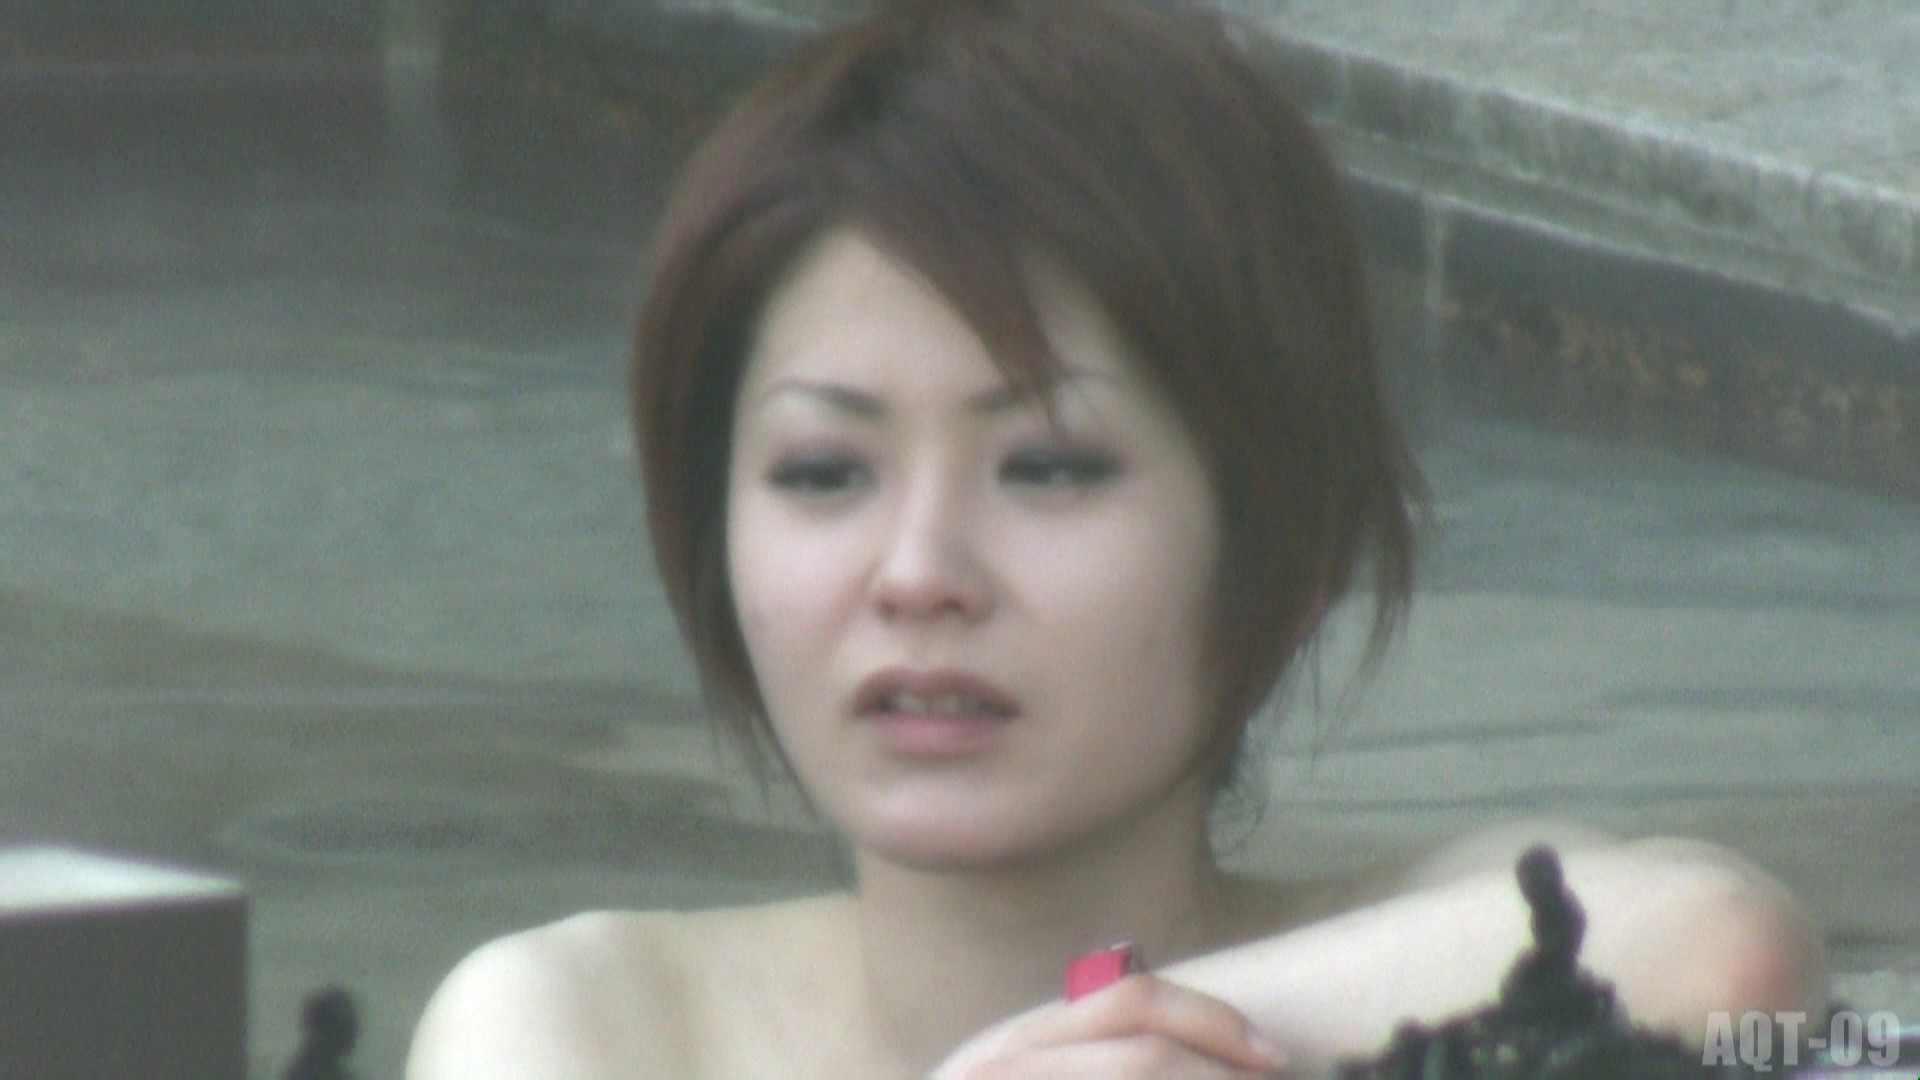 Aquaな露天風呂Vol.779 OLセックス 覗きおまんこ画像 107画像 53